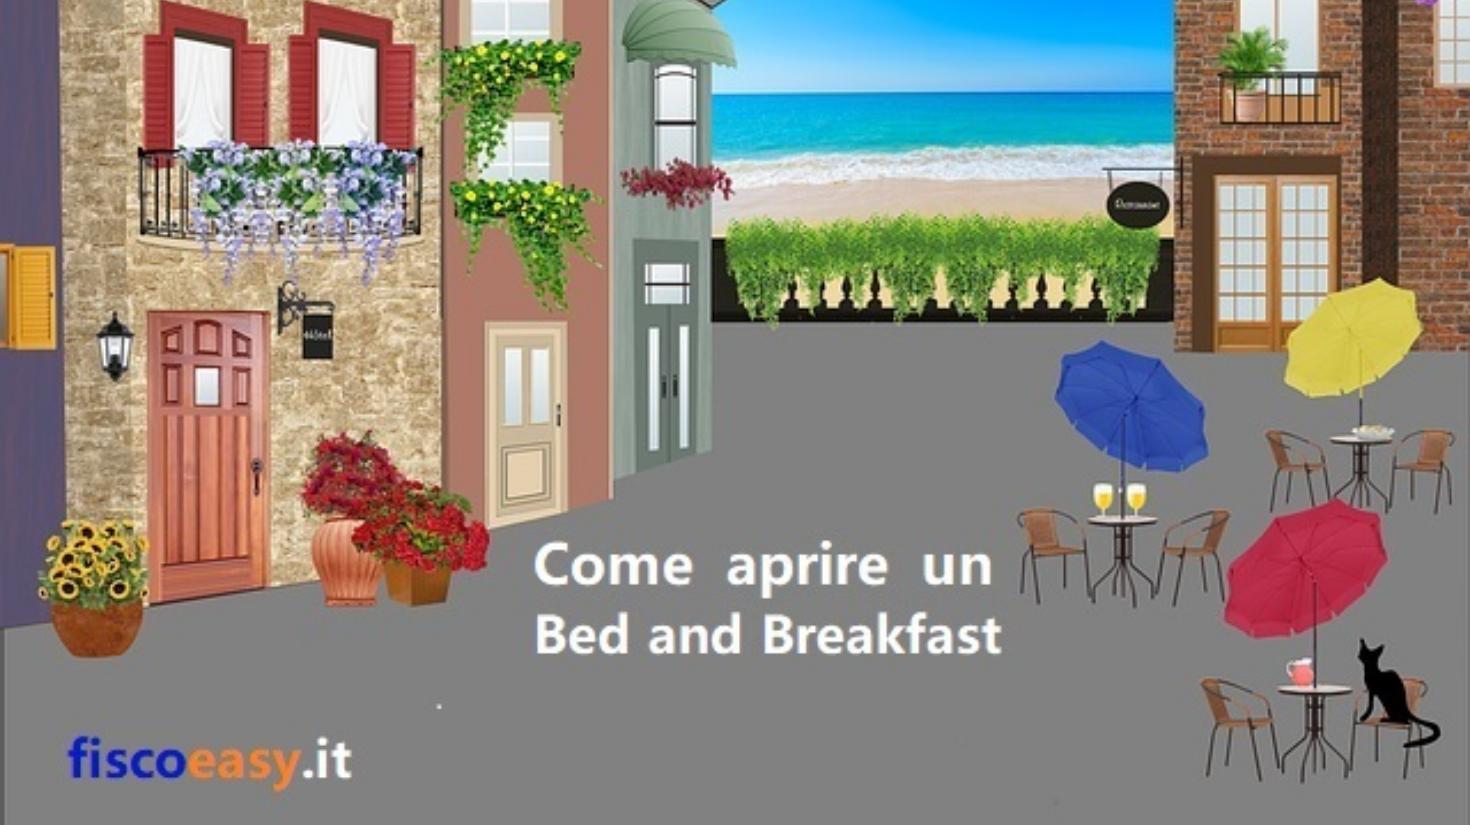 Come Allestire Un B&b come aprire un bed and breakfast - hype.news: free online